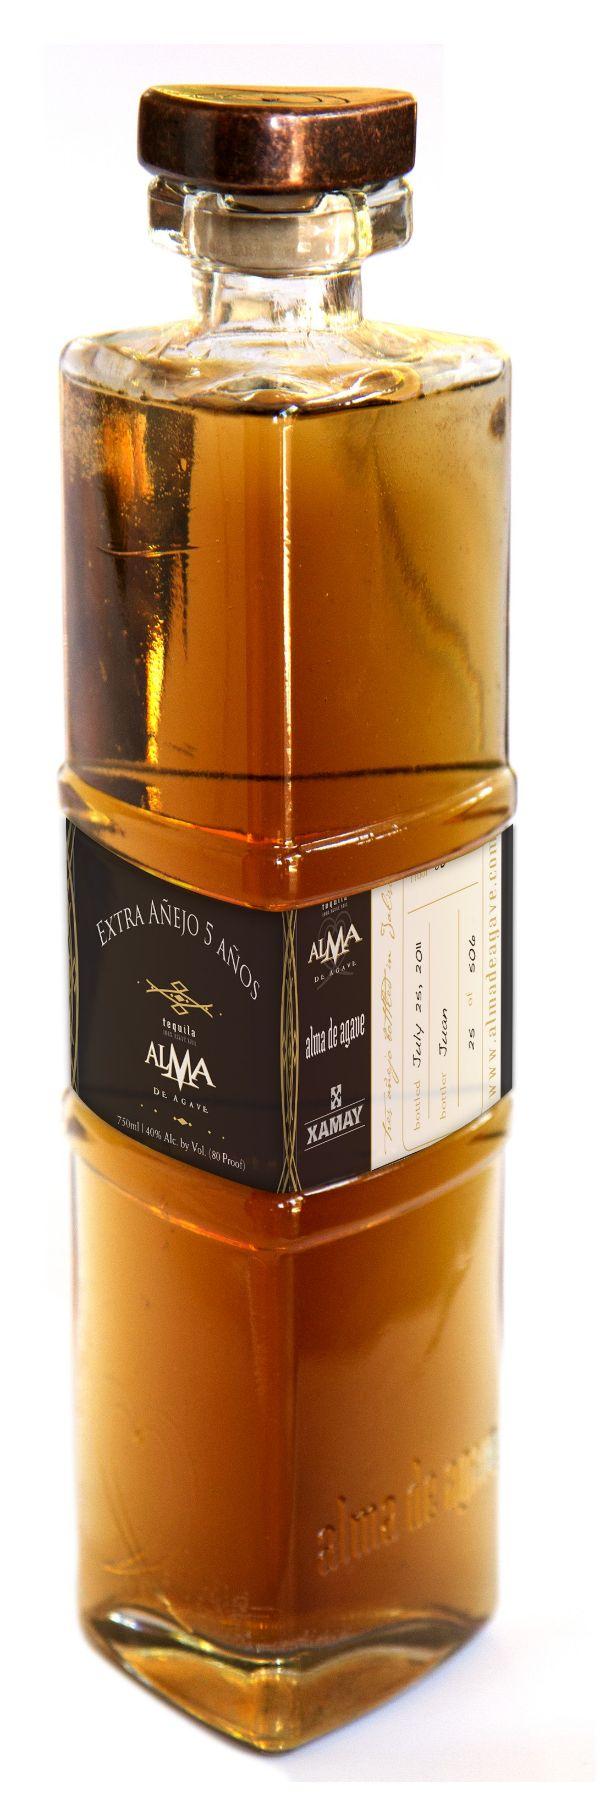 Alma de Agave Autentico 5 Yr Extra Anejo Tequila